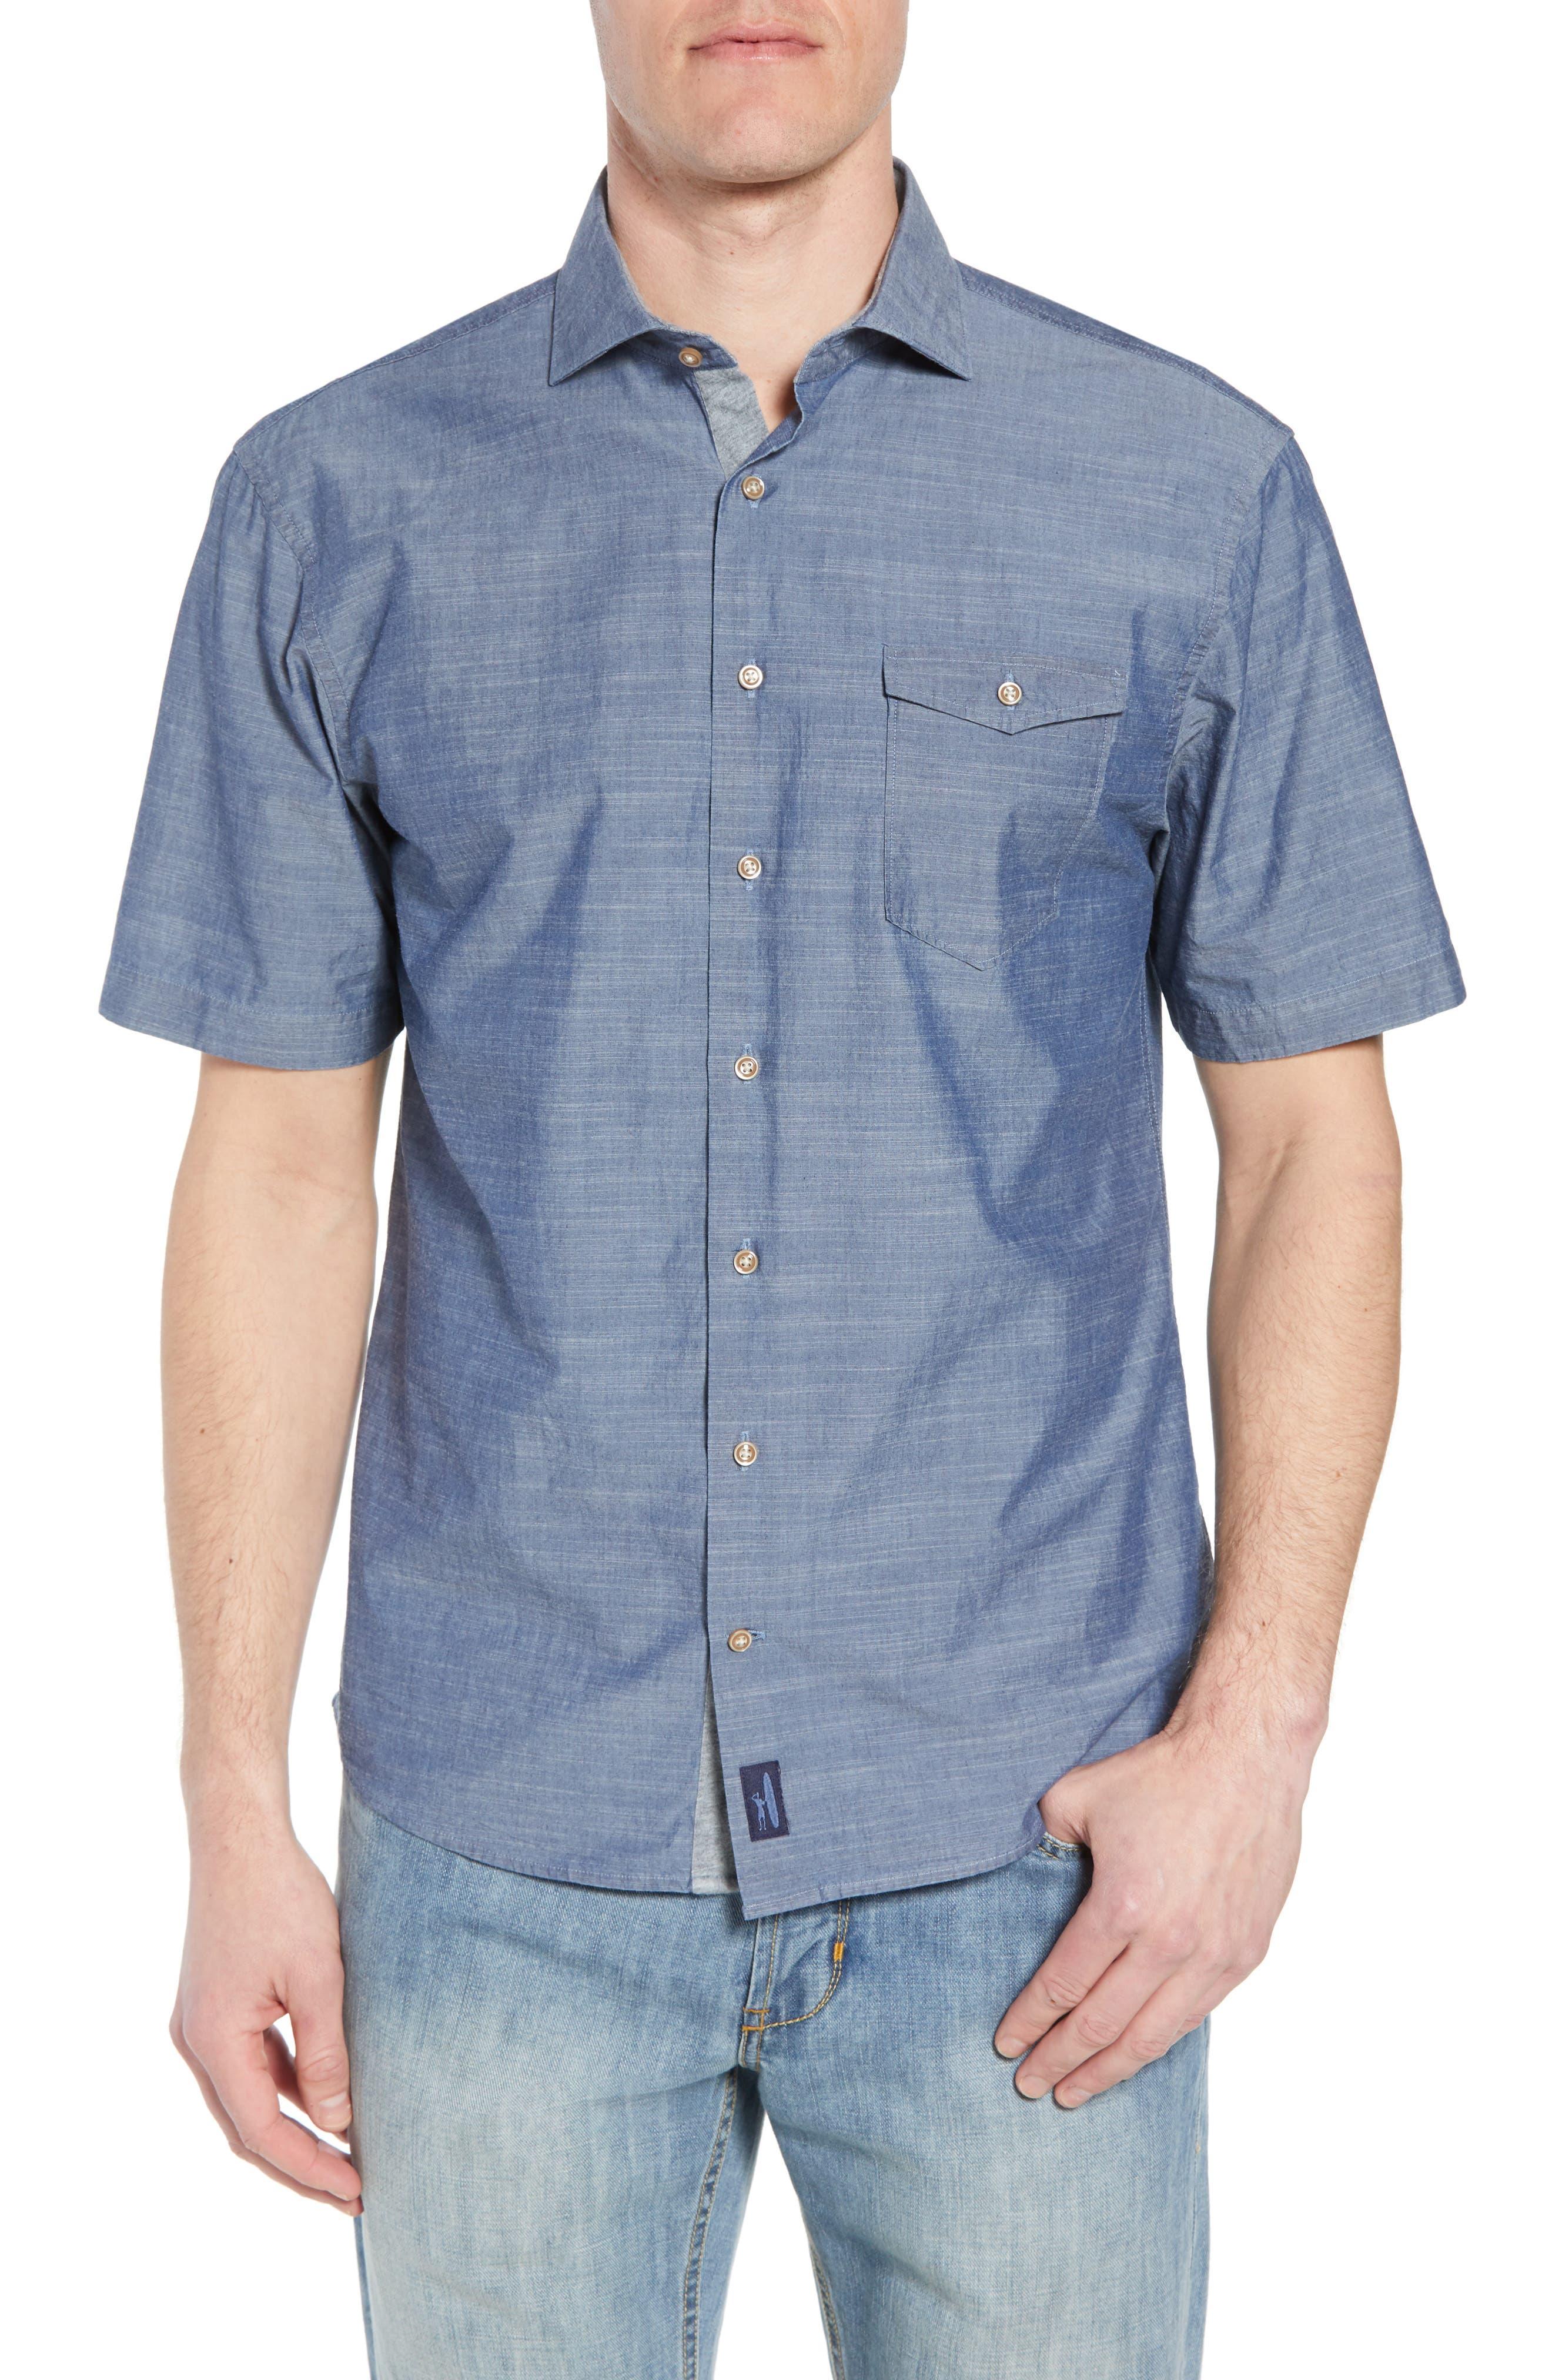 Lucas Regular Fit Chambray Sport Shirt,                         Main,                         color, 403